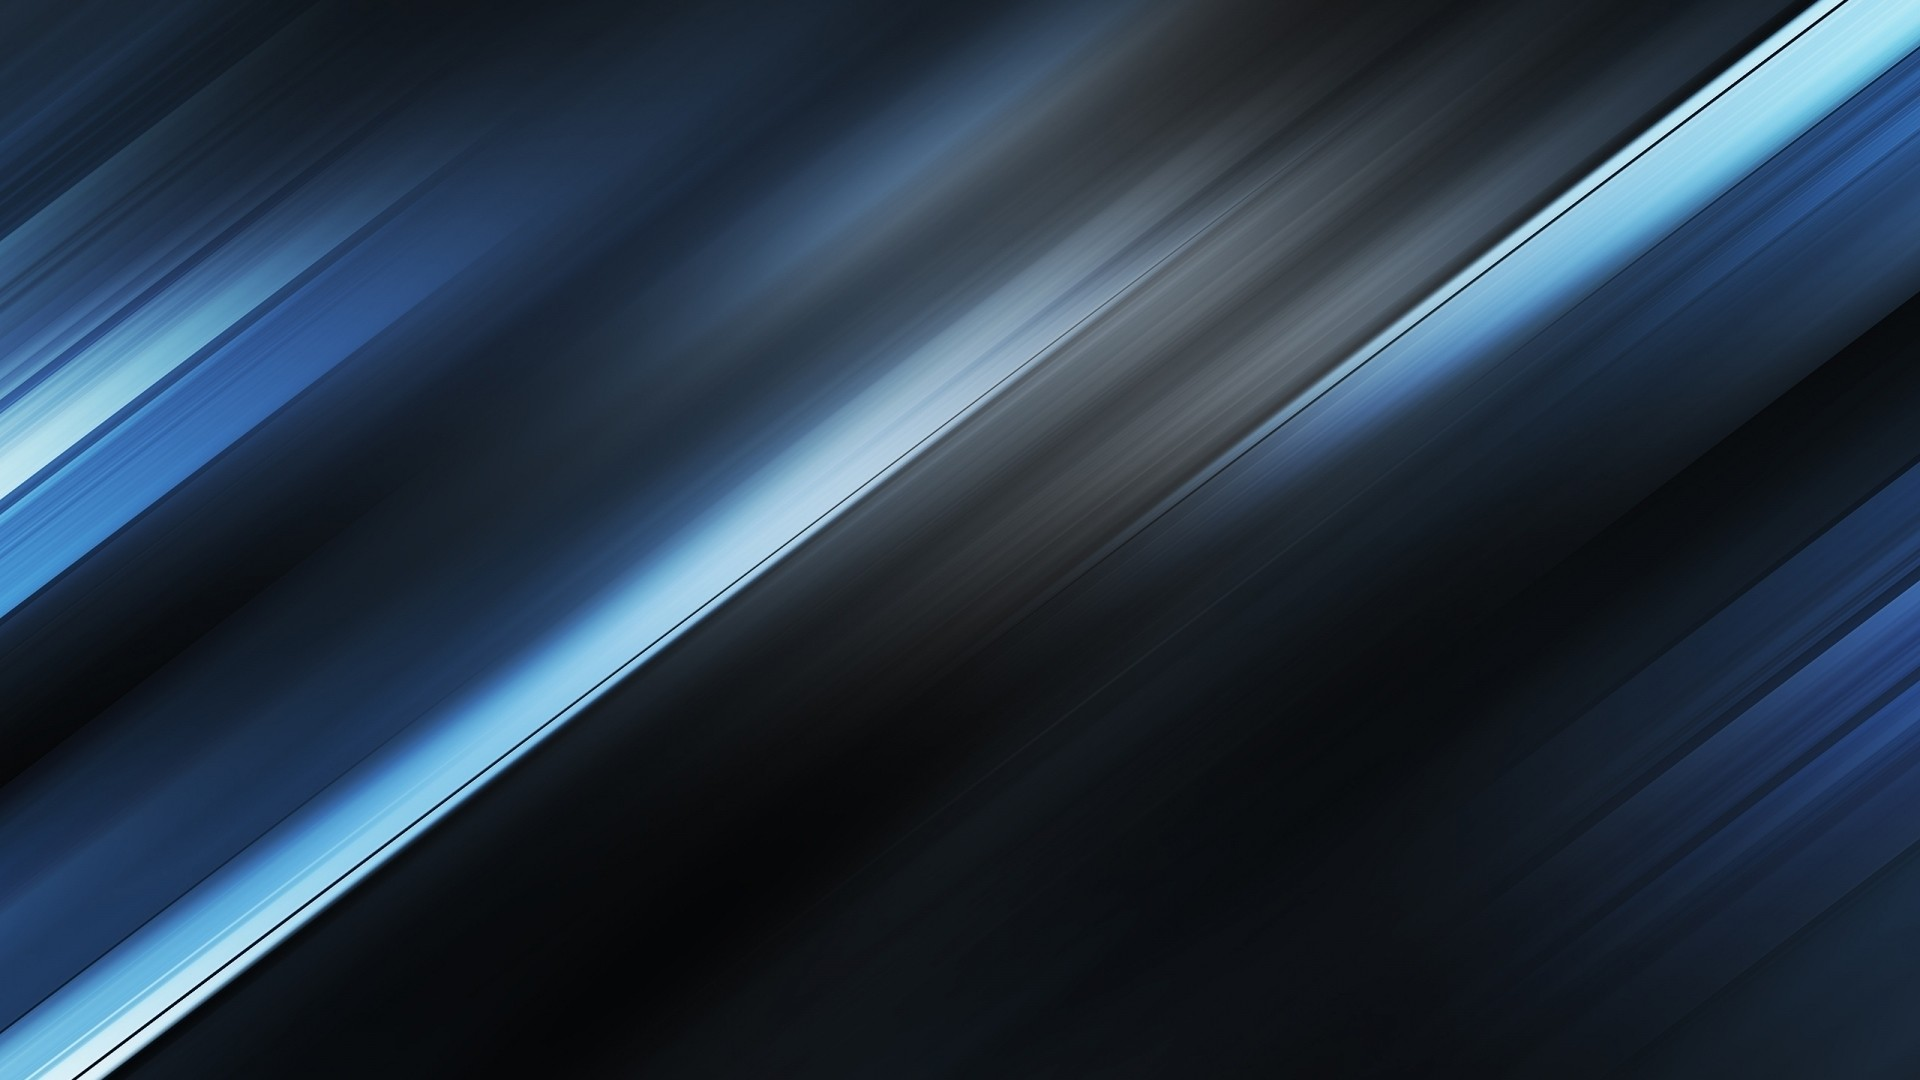 Cool Blue Wallpaper 1080p